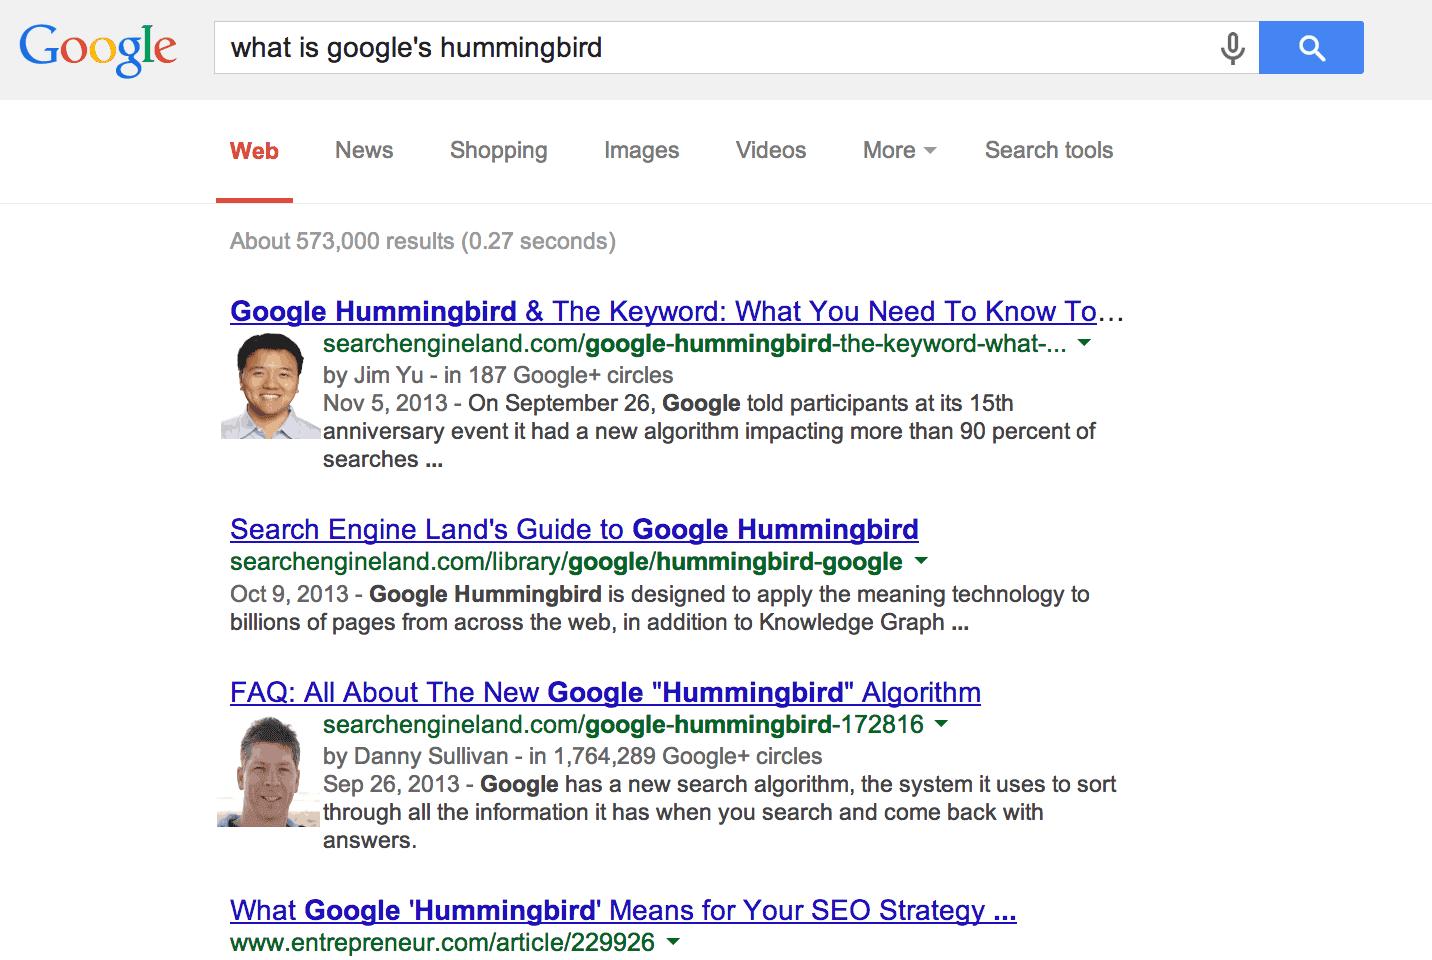 Kết quả tìm kiếm cho Google Hummingbird, 2013